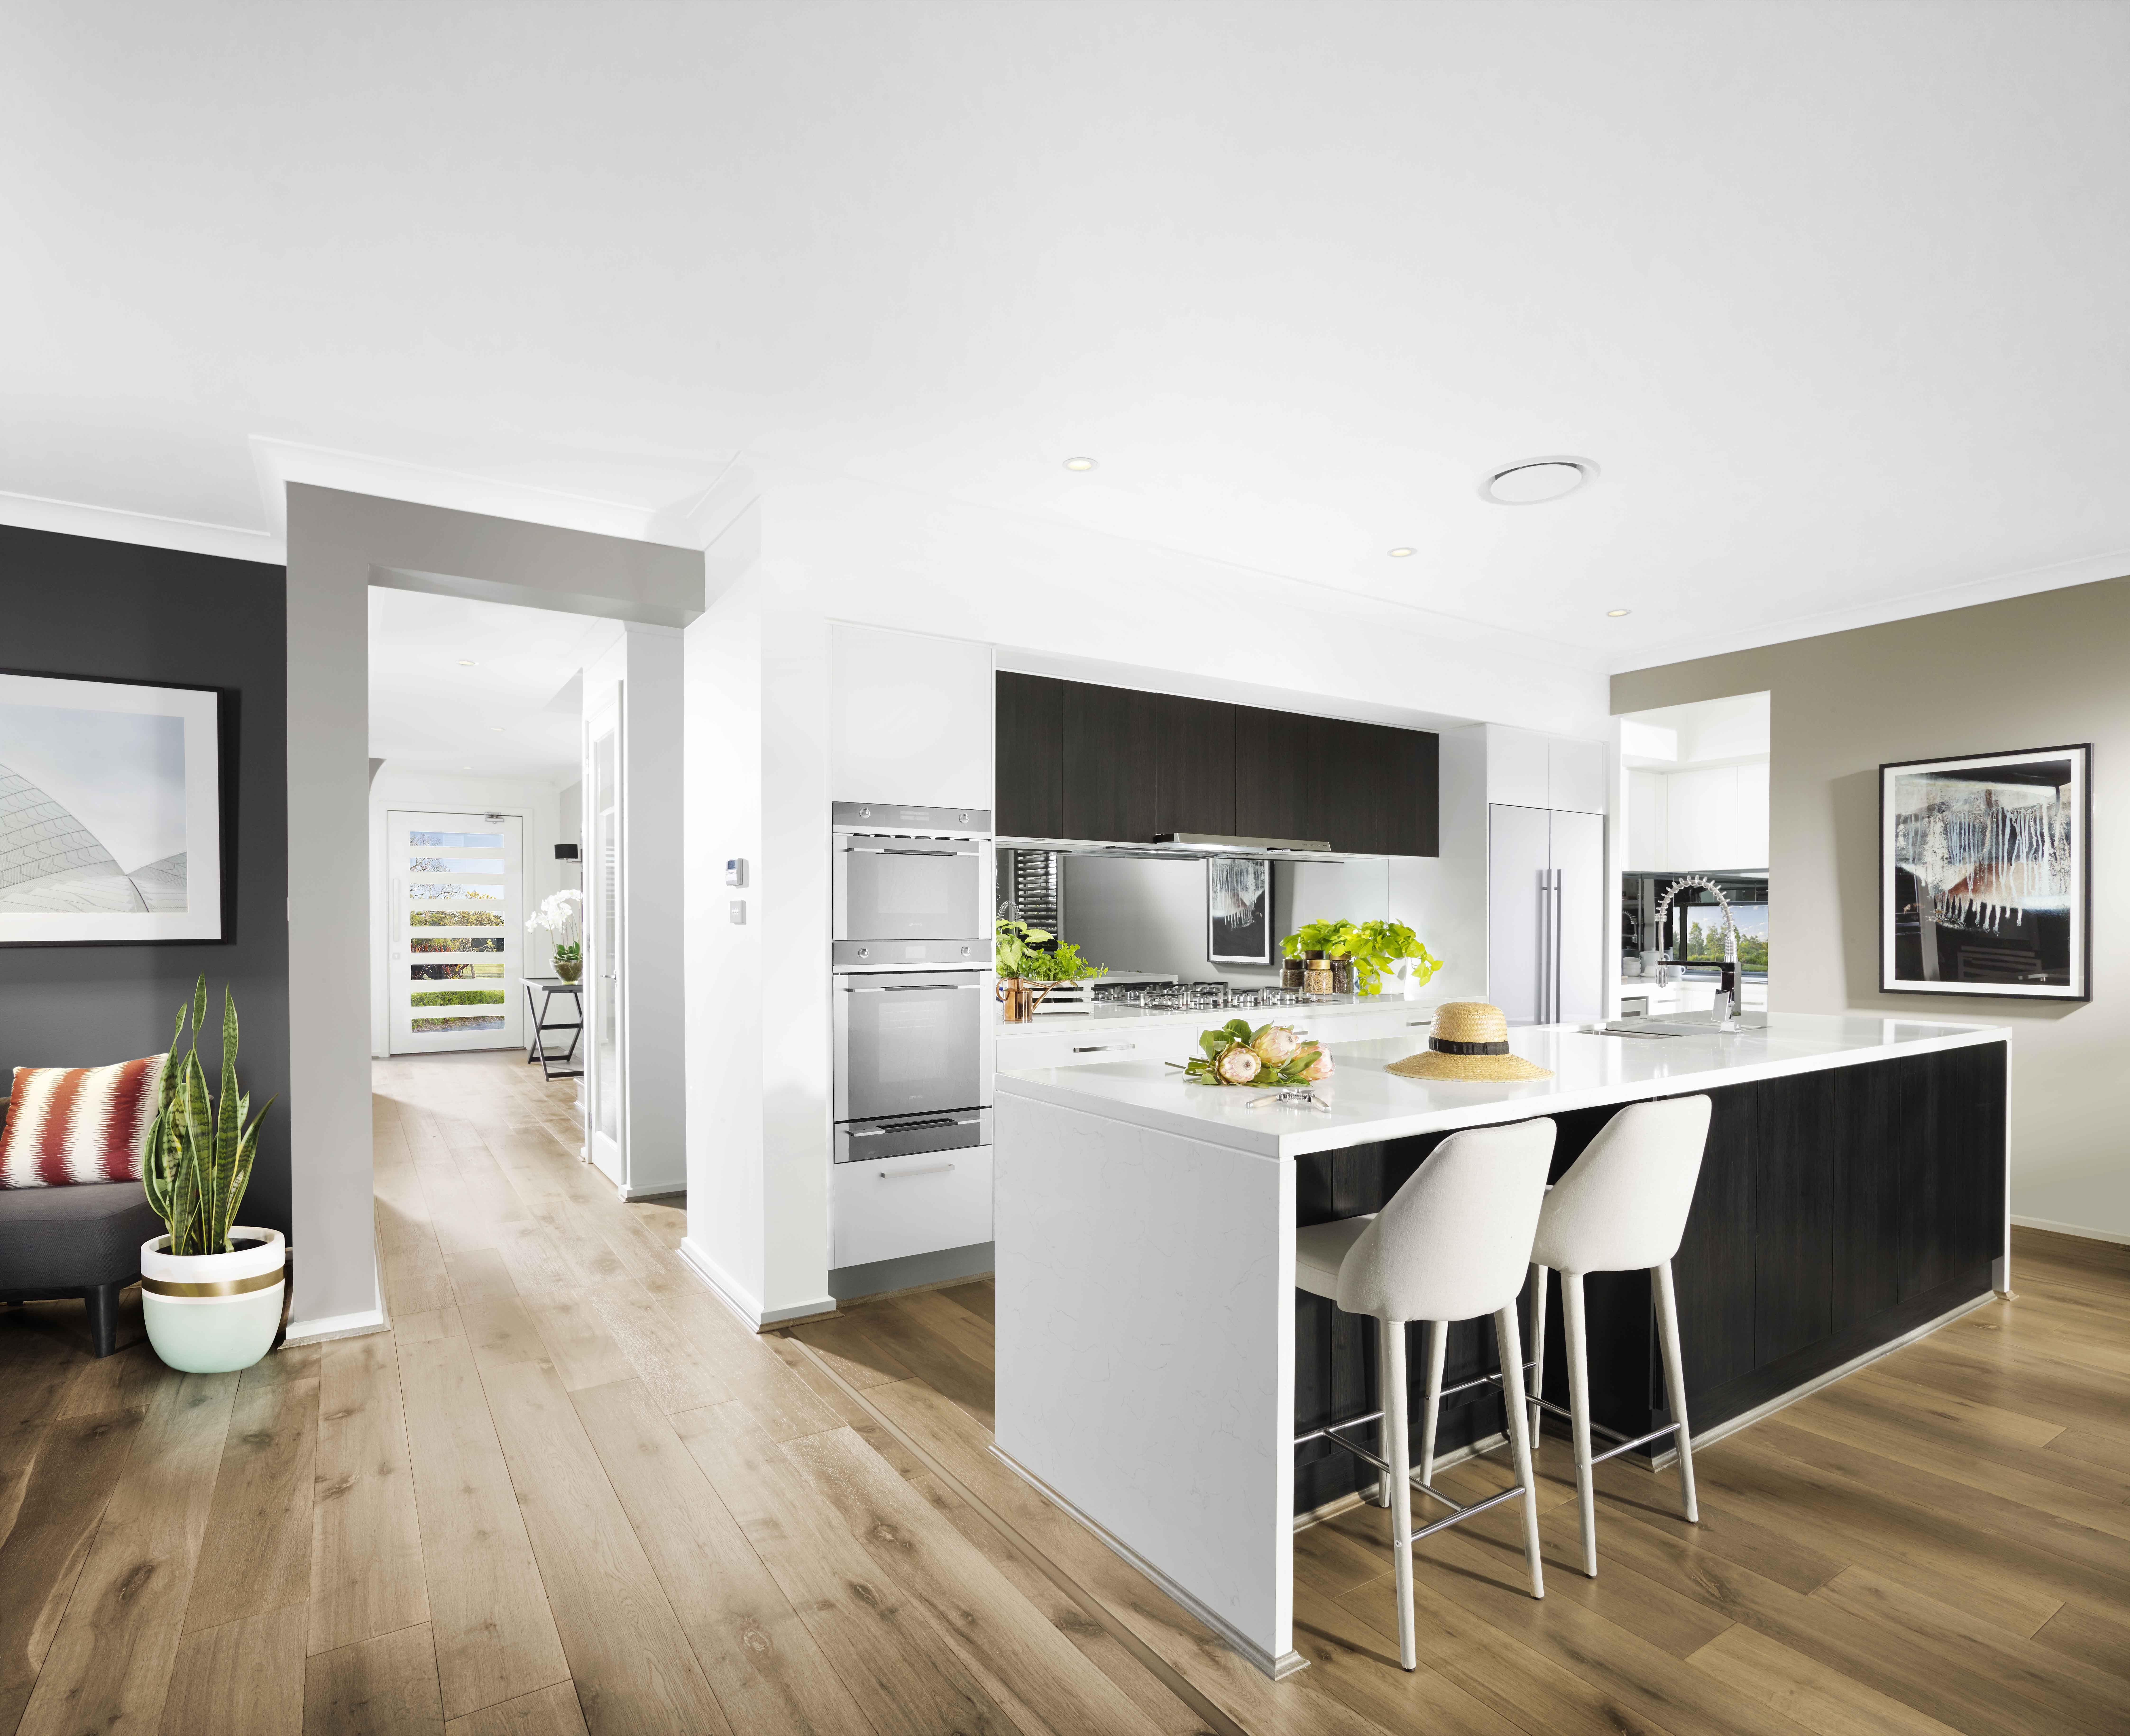 Sheridan 36 || Clarendon Homes Kitchens | Kitchens | Pinterest ...